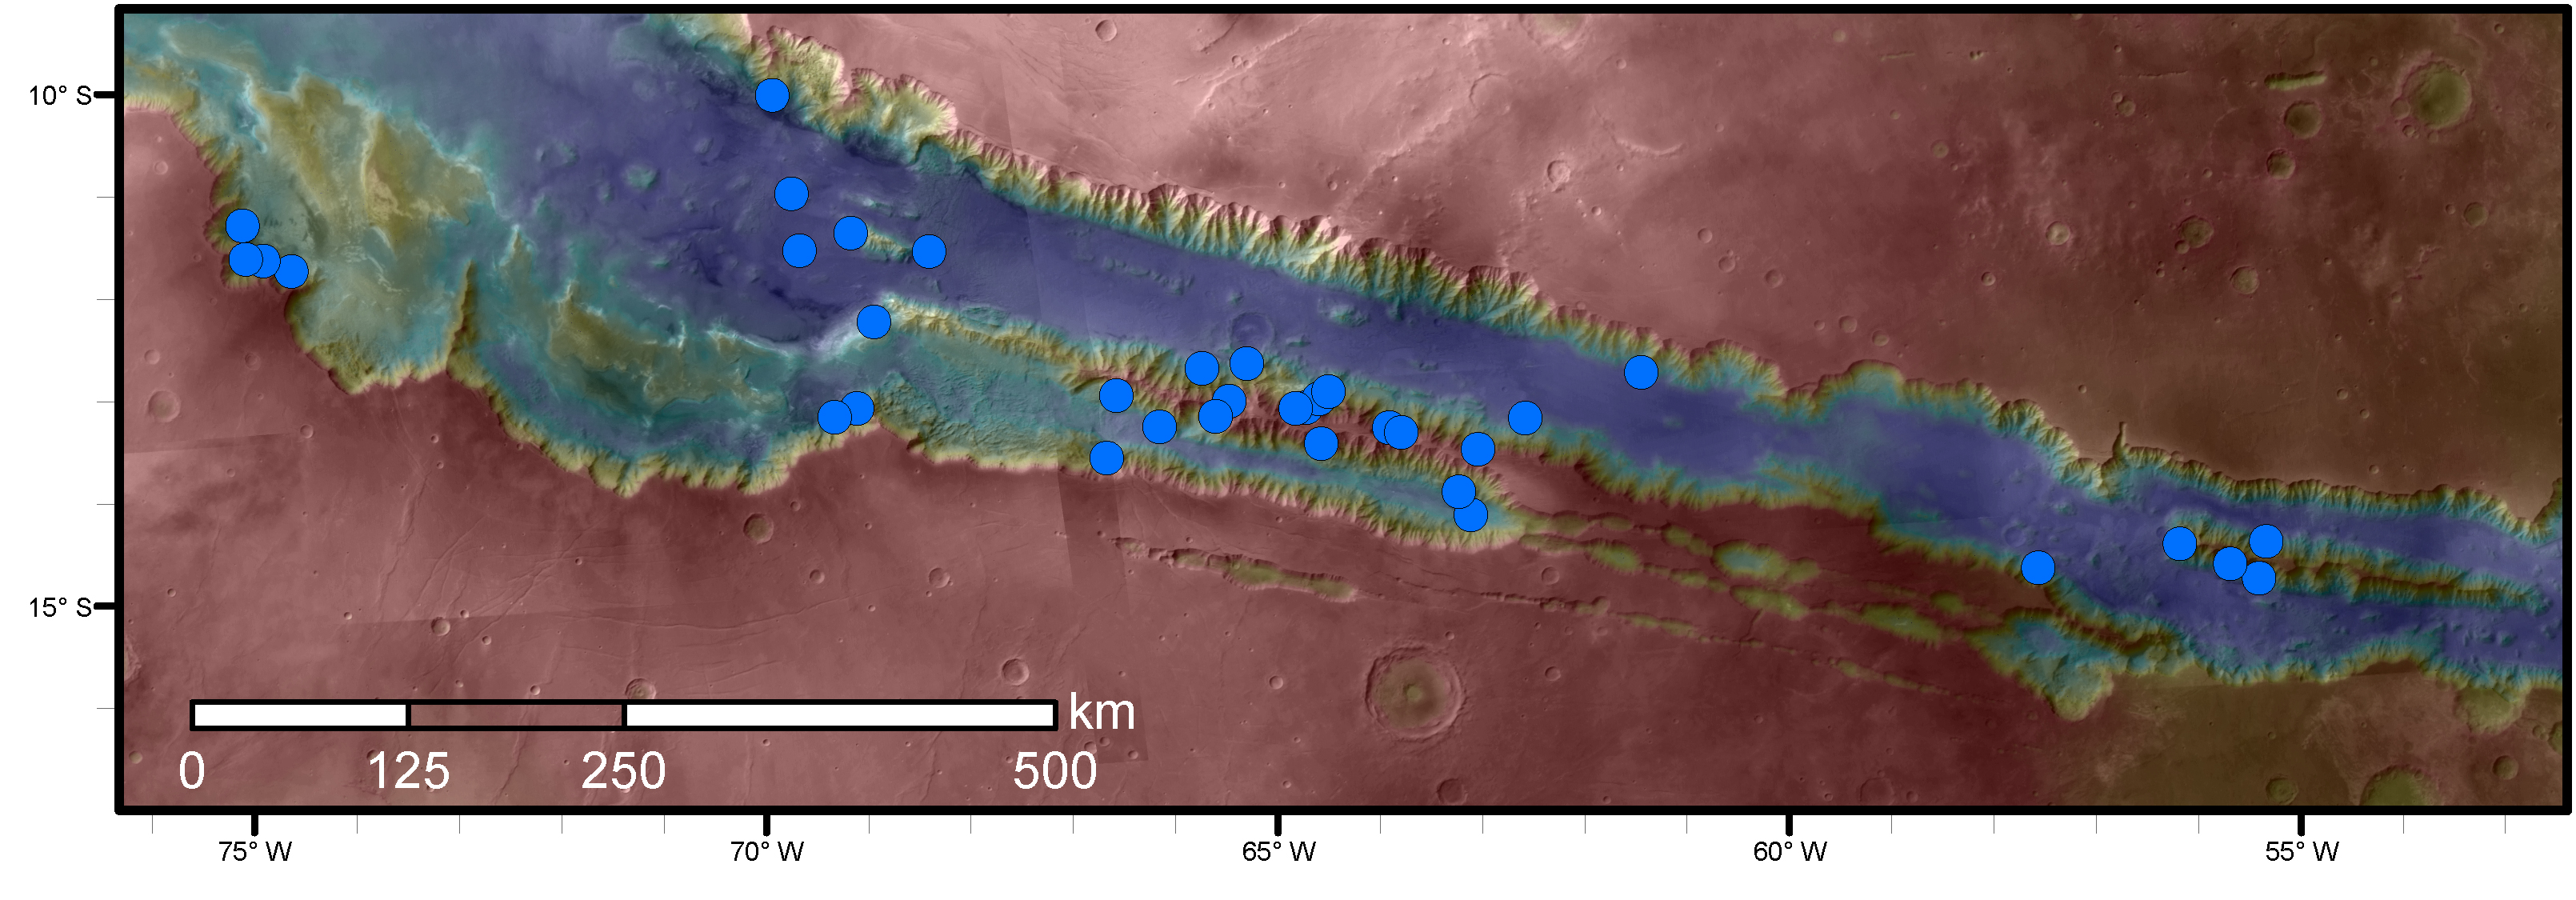 rsl-slope-lineae-water-mars-orbiter-valles-marineris-hirise-pia20756-full